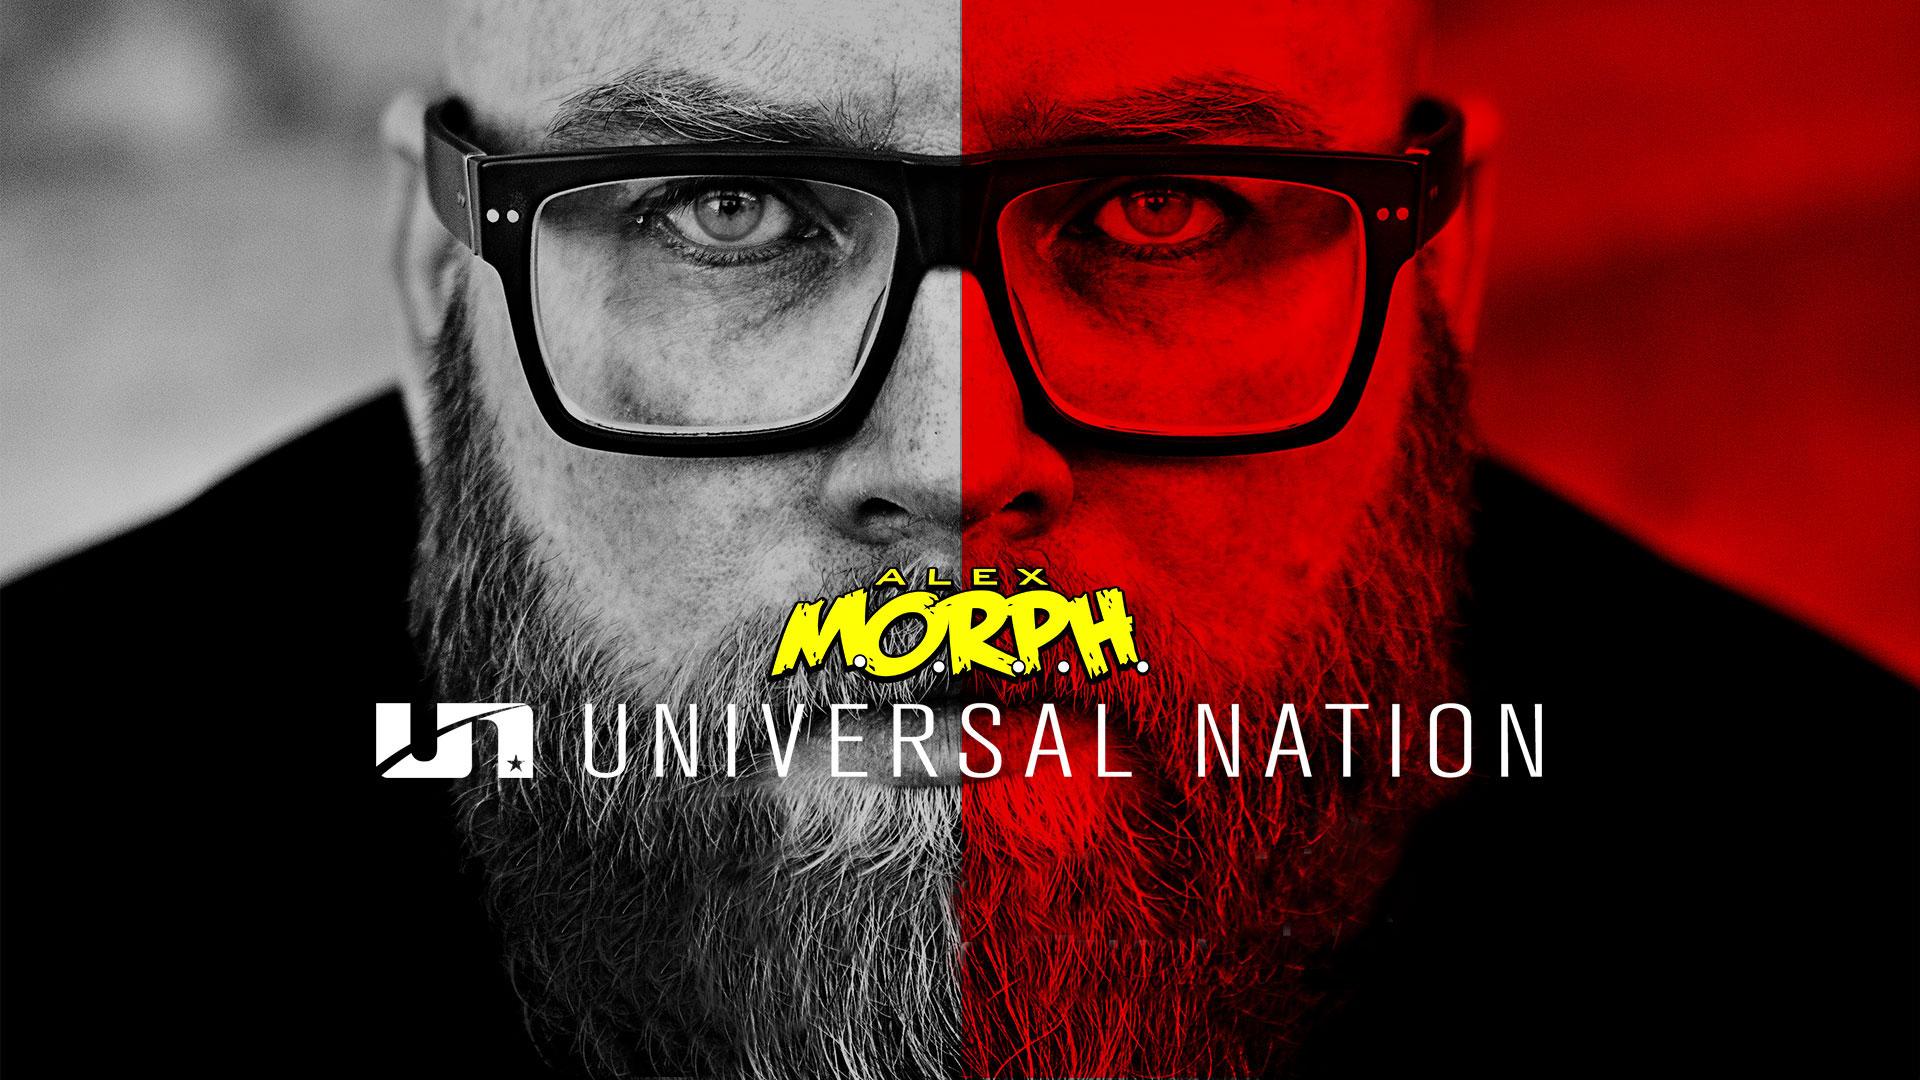 UNIVERSAL NATION mit Alex M.O.R.P.H.